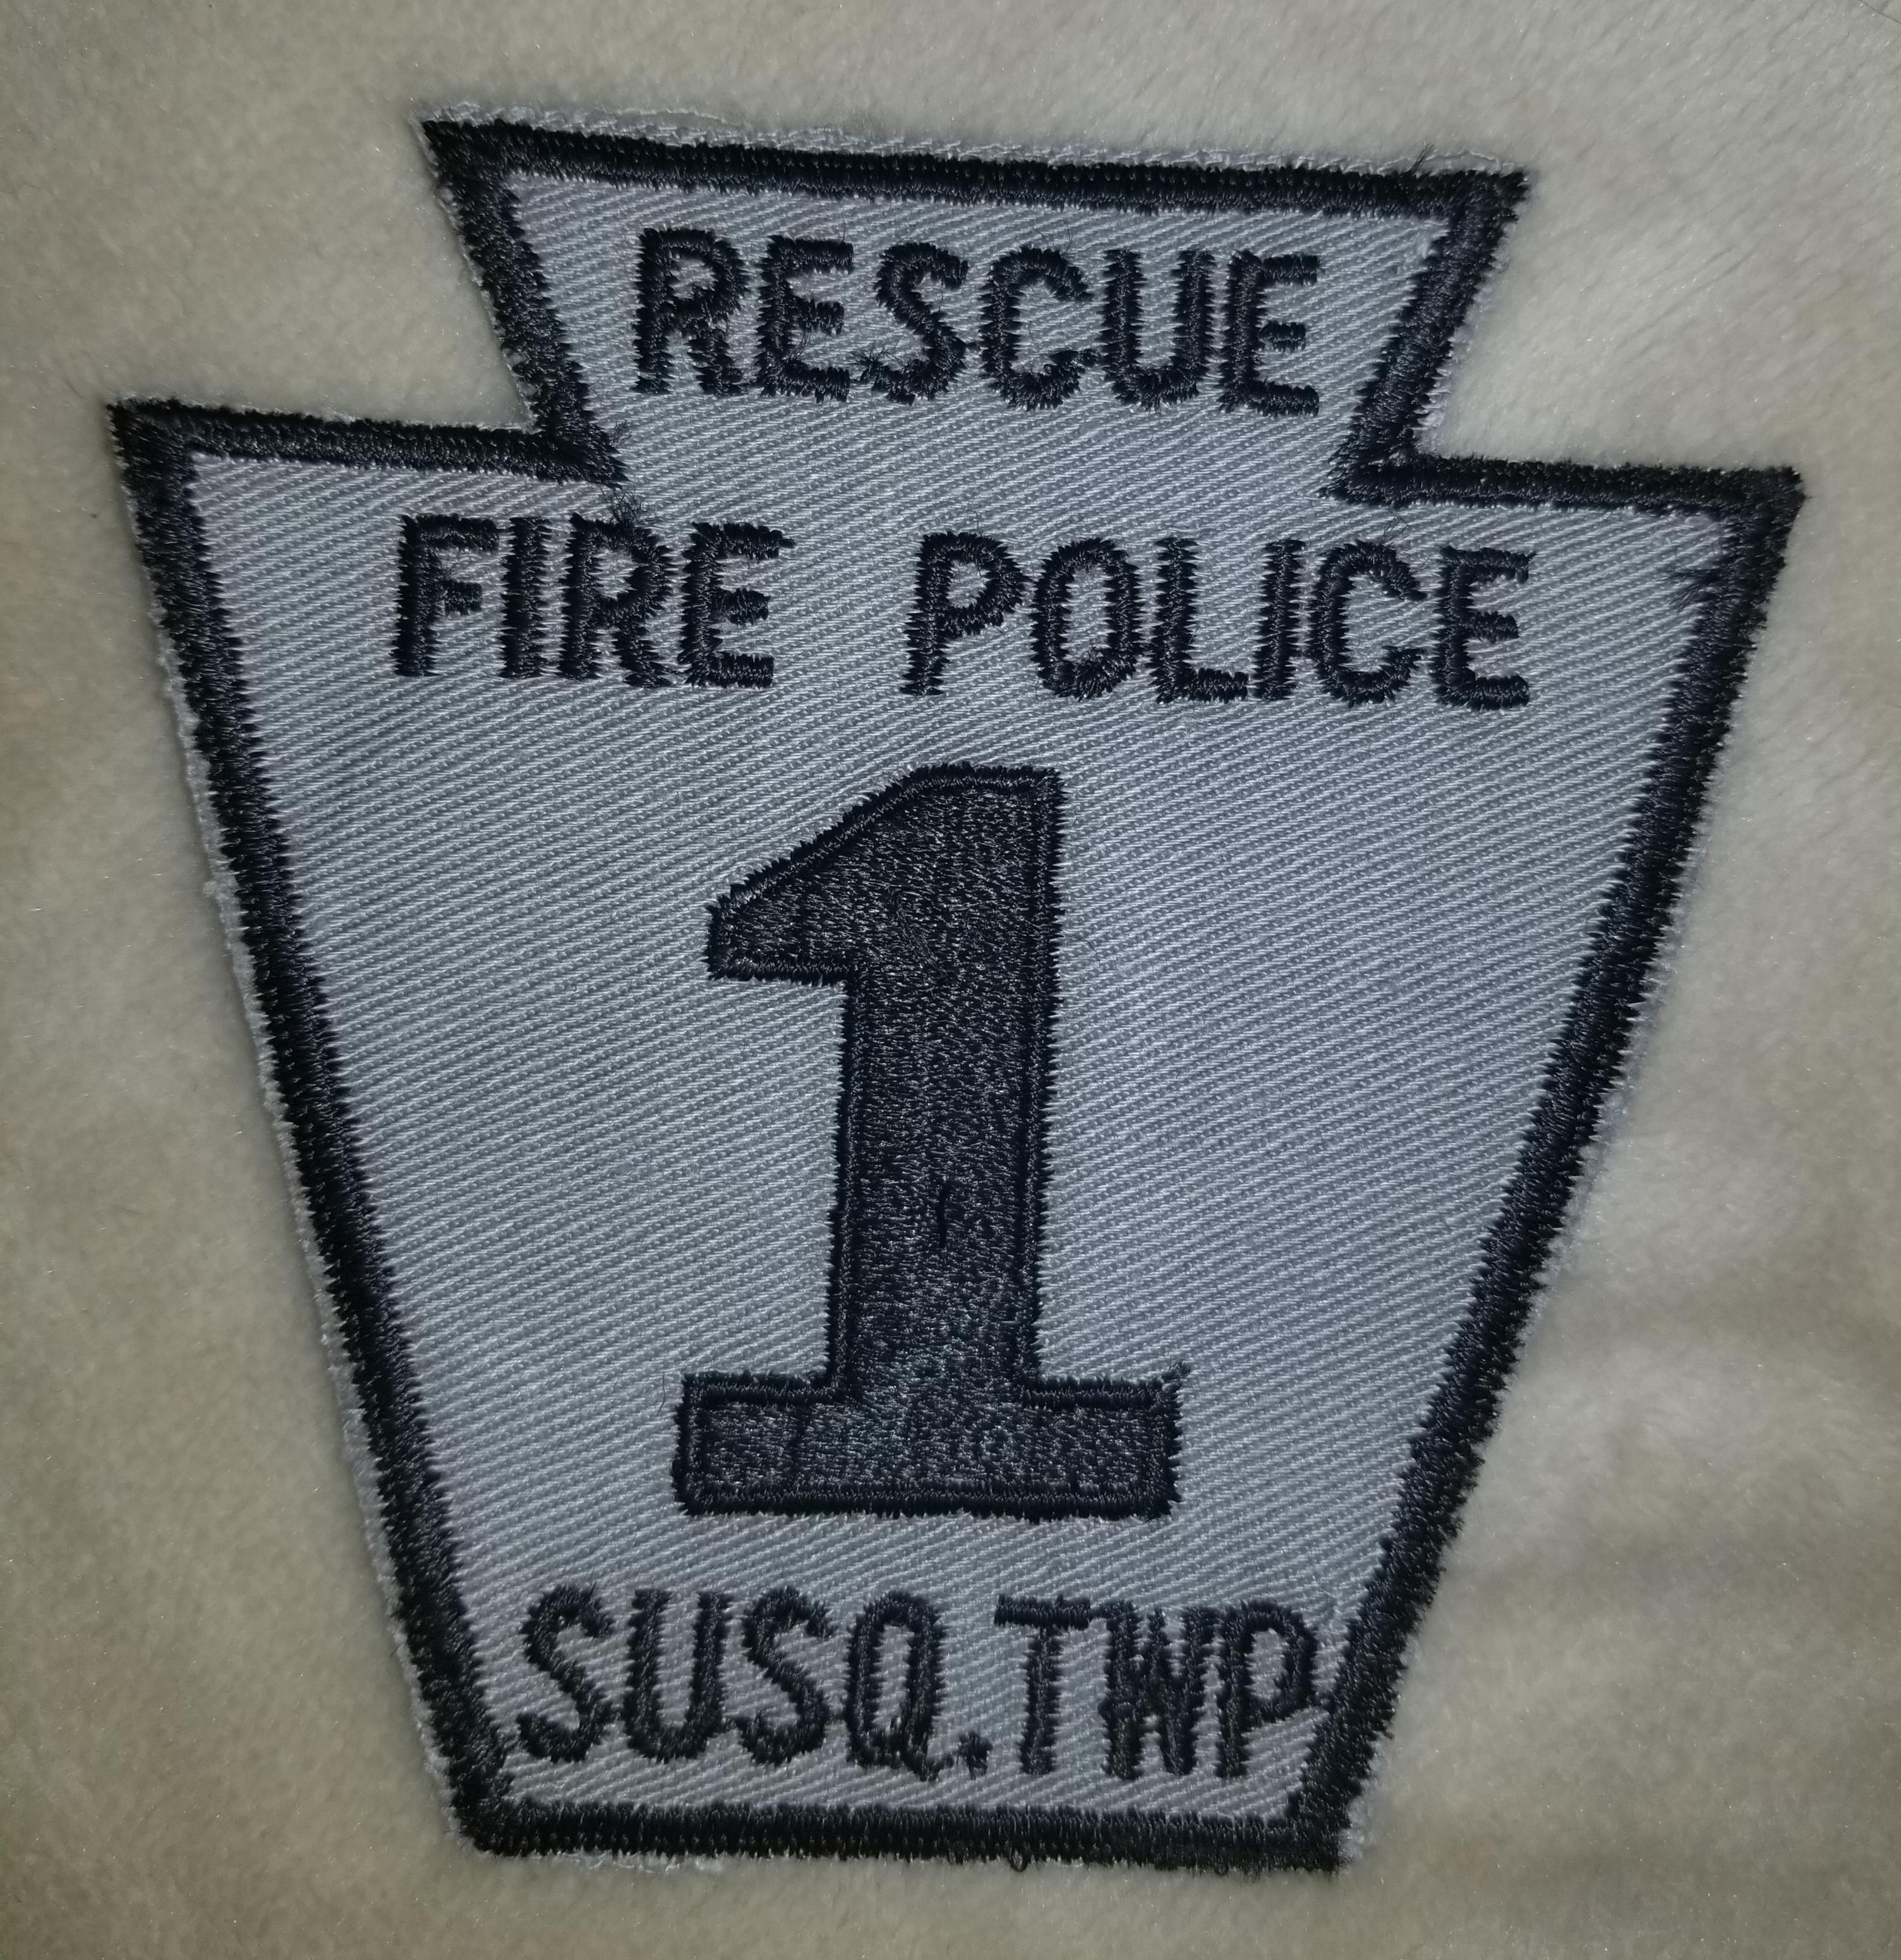 Susquehanna Township Fire Police PA